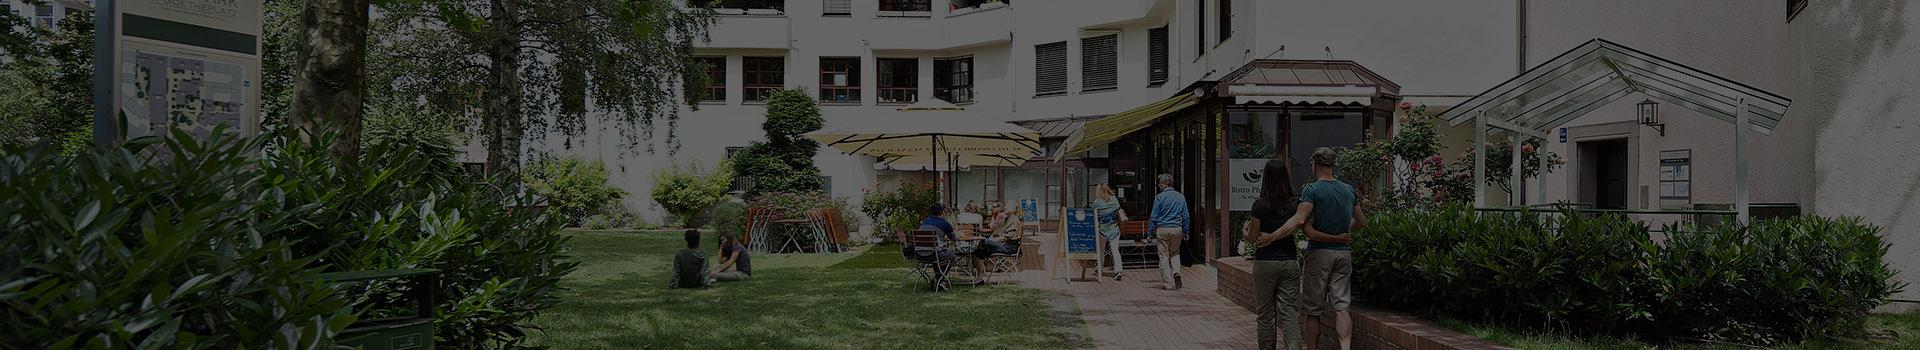 Cafe im Citypark